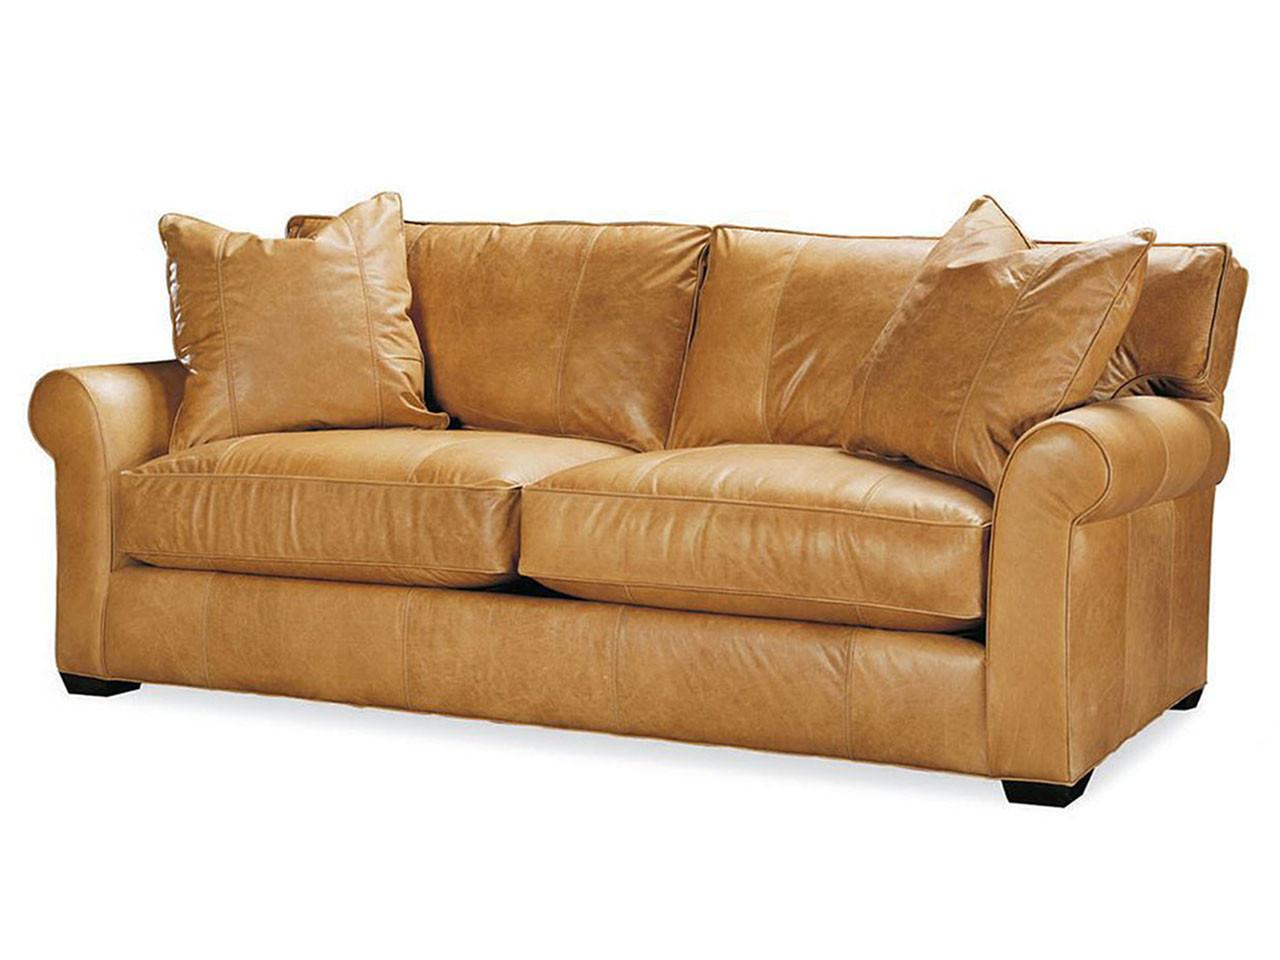 Jessie Leather Queen Sleeper Leather Sleeper Sofas Sofa